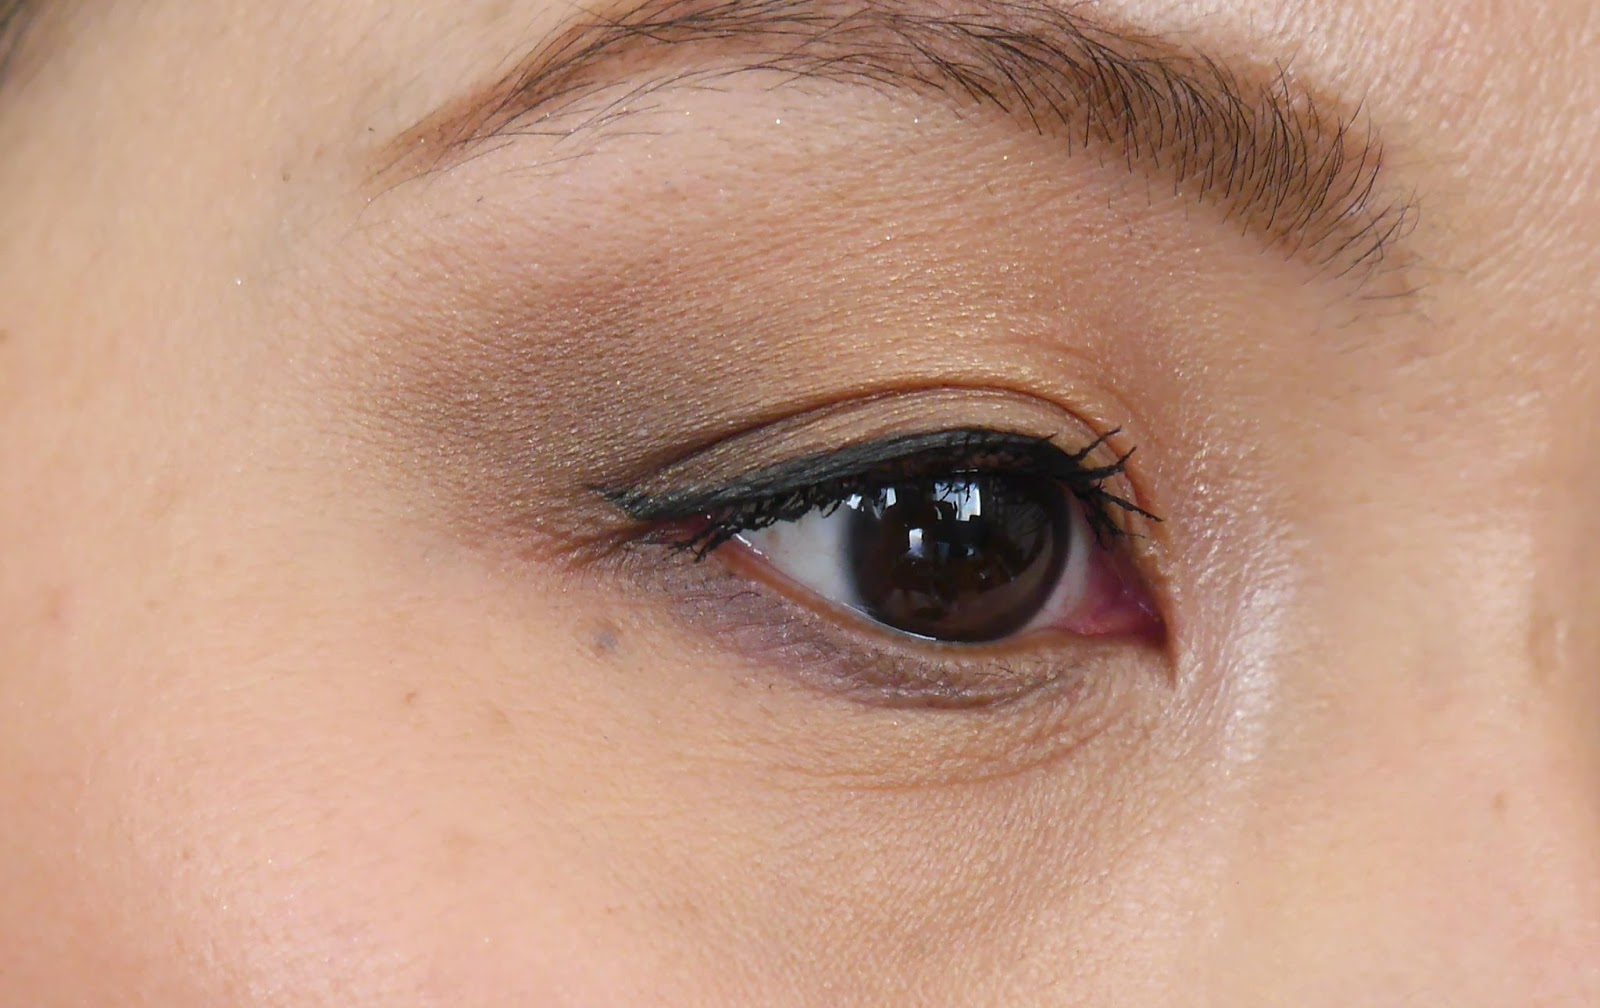 Beauty & Health, blusher, eye liner, eyebrow gel, eyebrow pencil, eyeshadow base, eyeshadows, FOTD, foundation, lipstick, mascara, motd, fotd